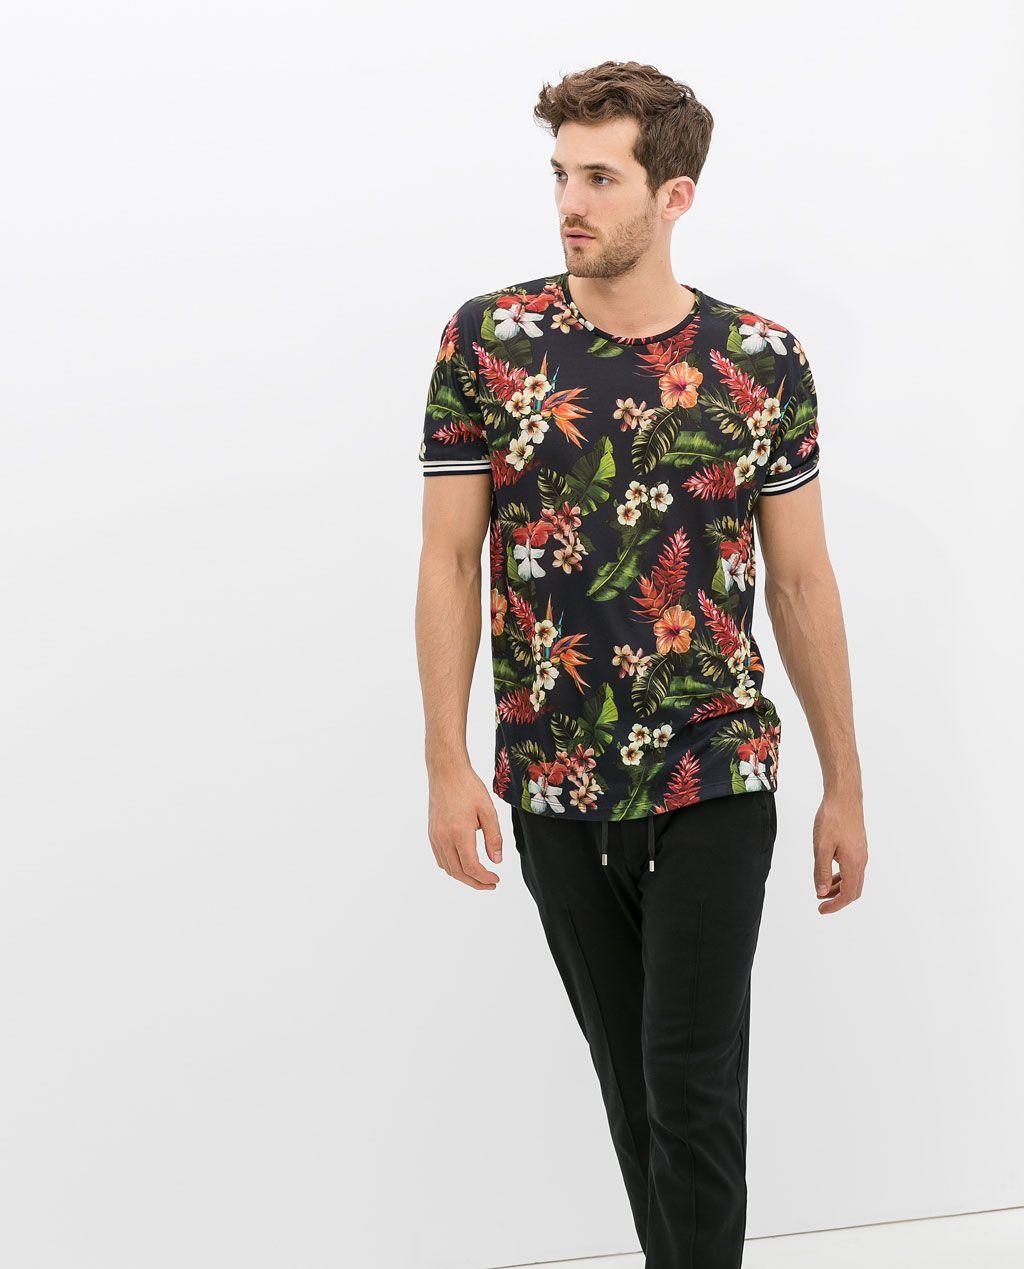 Camiseta Zara Estampada Hombre Zara Hombre Flores Camiseta Estampada SpULzVjqMG